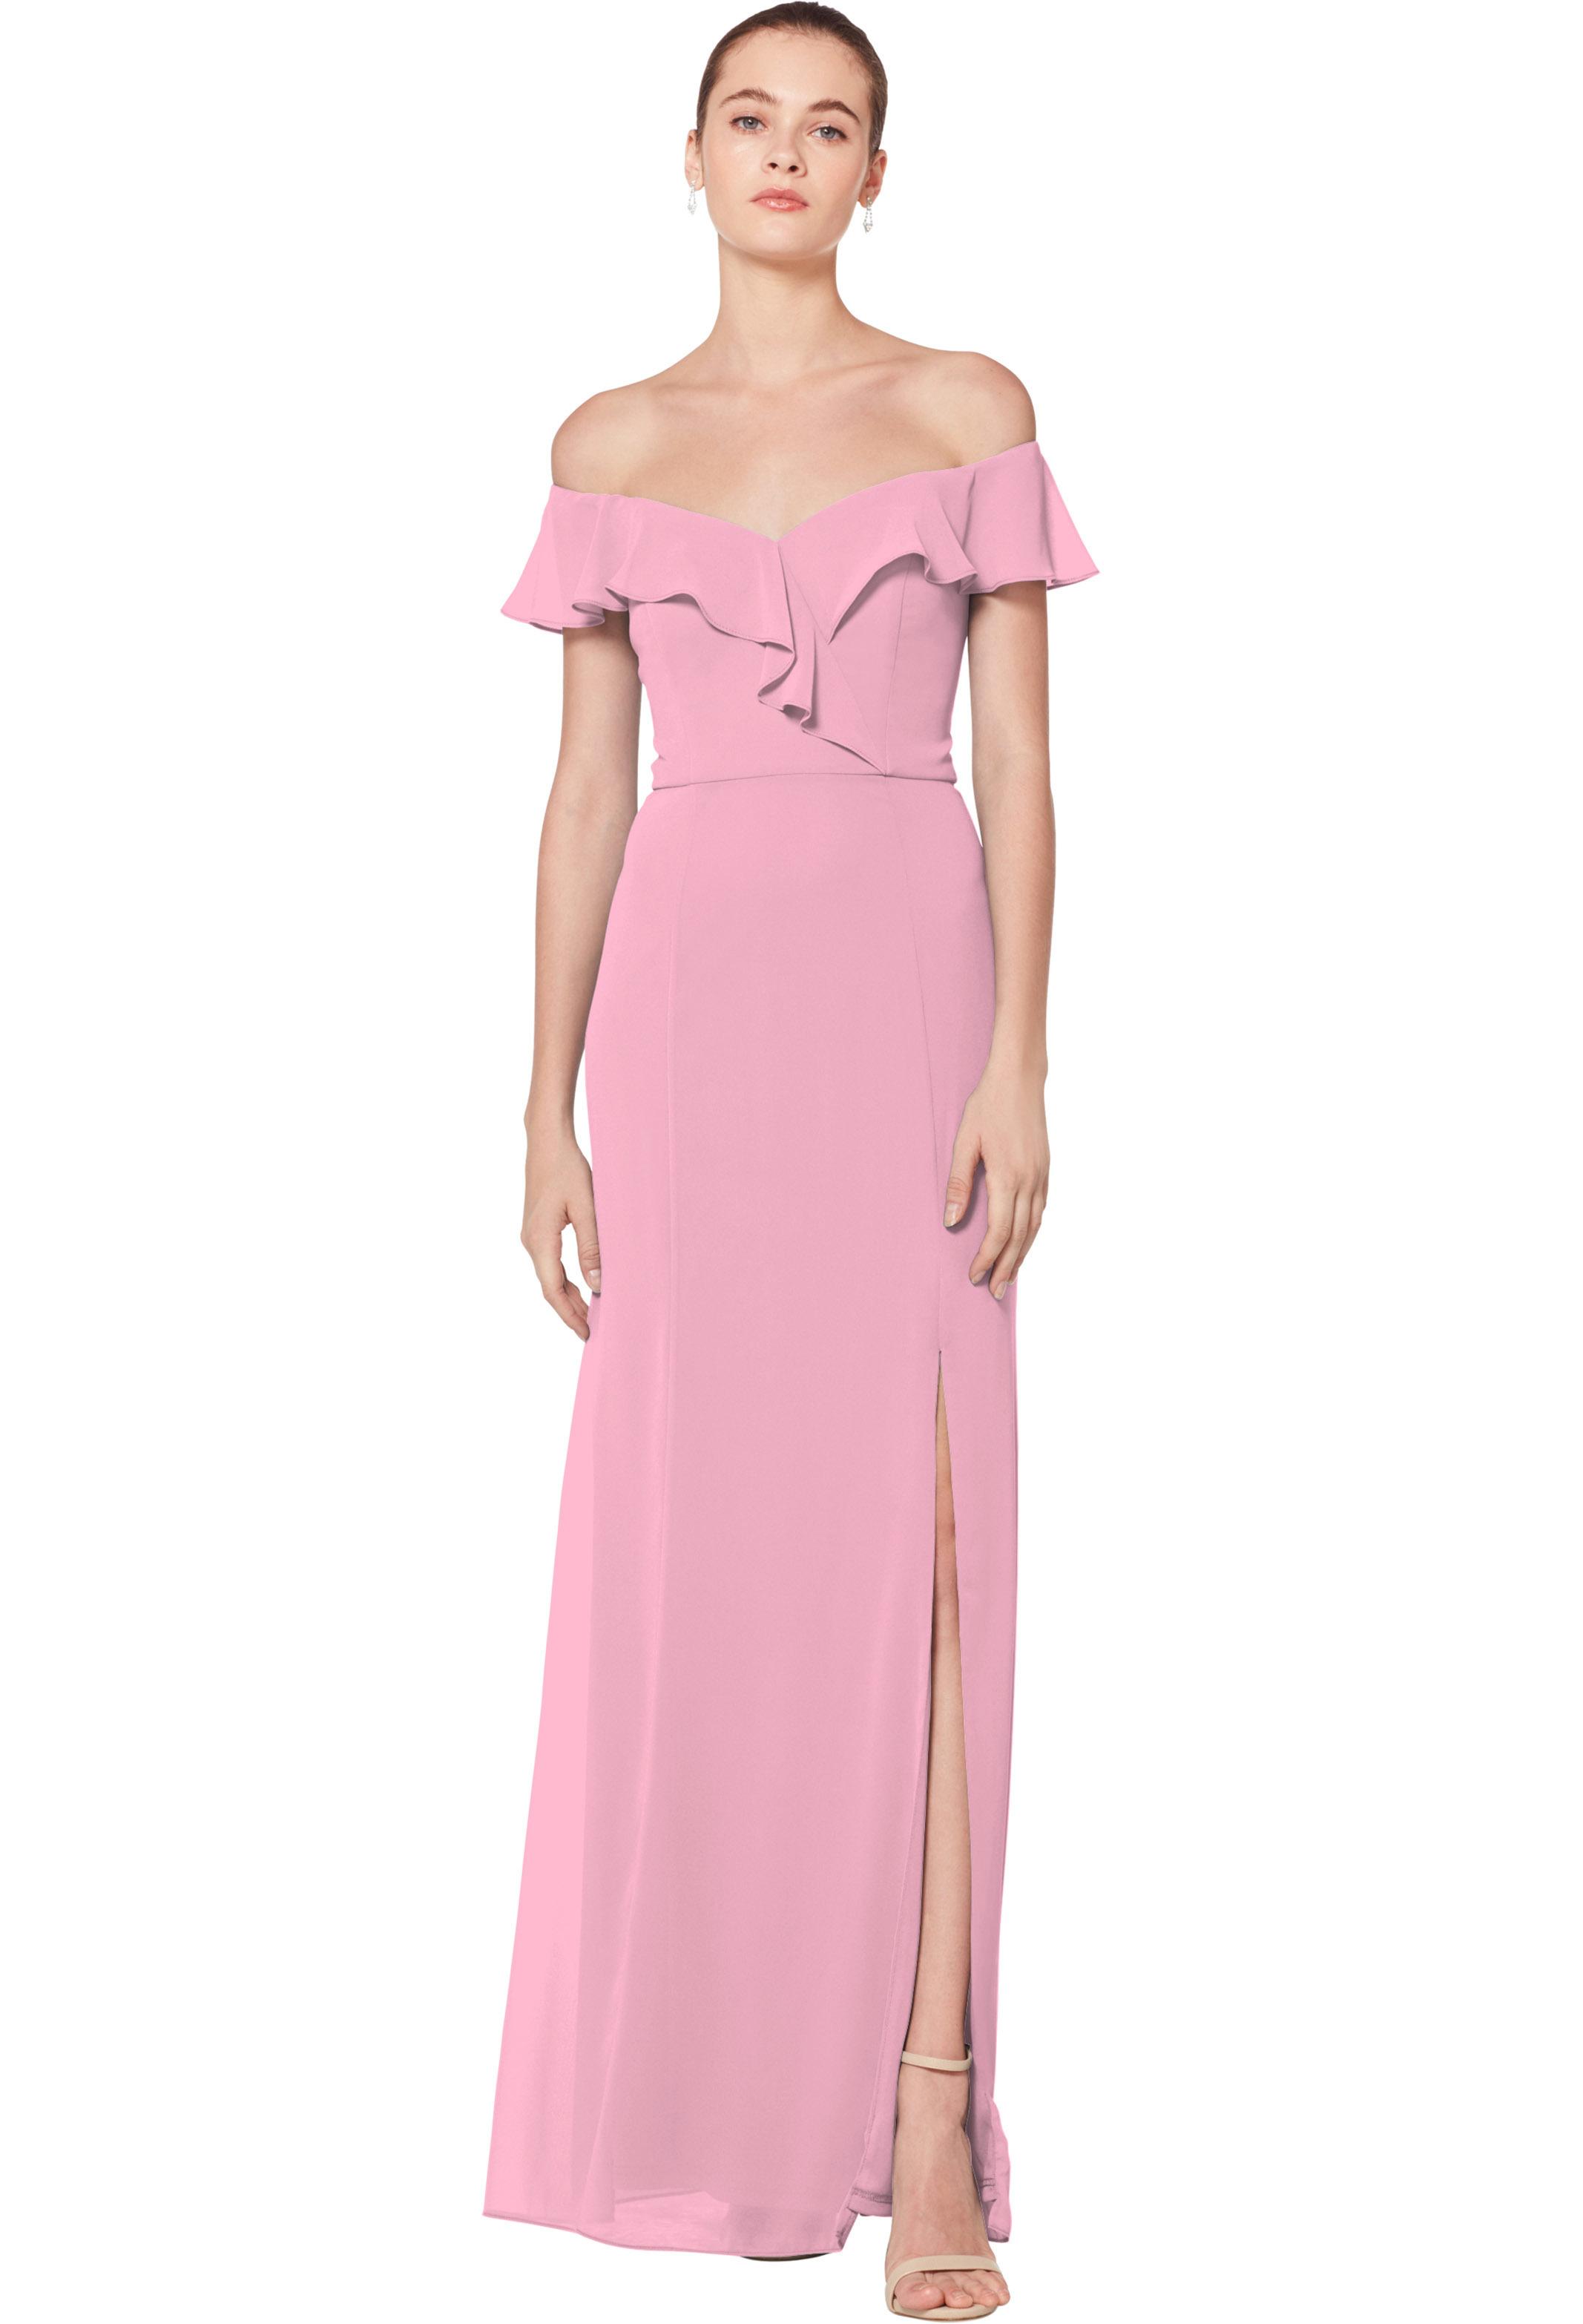 Bill Levkoff ROSEPETAL Chiffon Sweetheart Floor Length gown, $170.00 Front